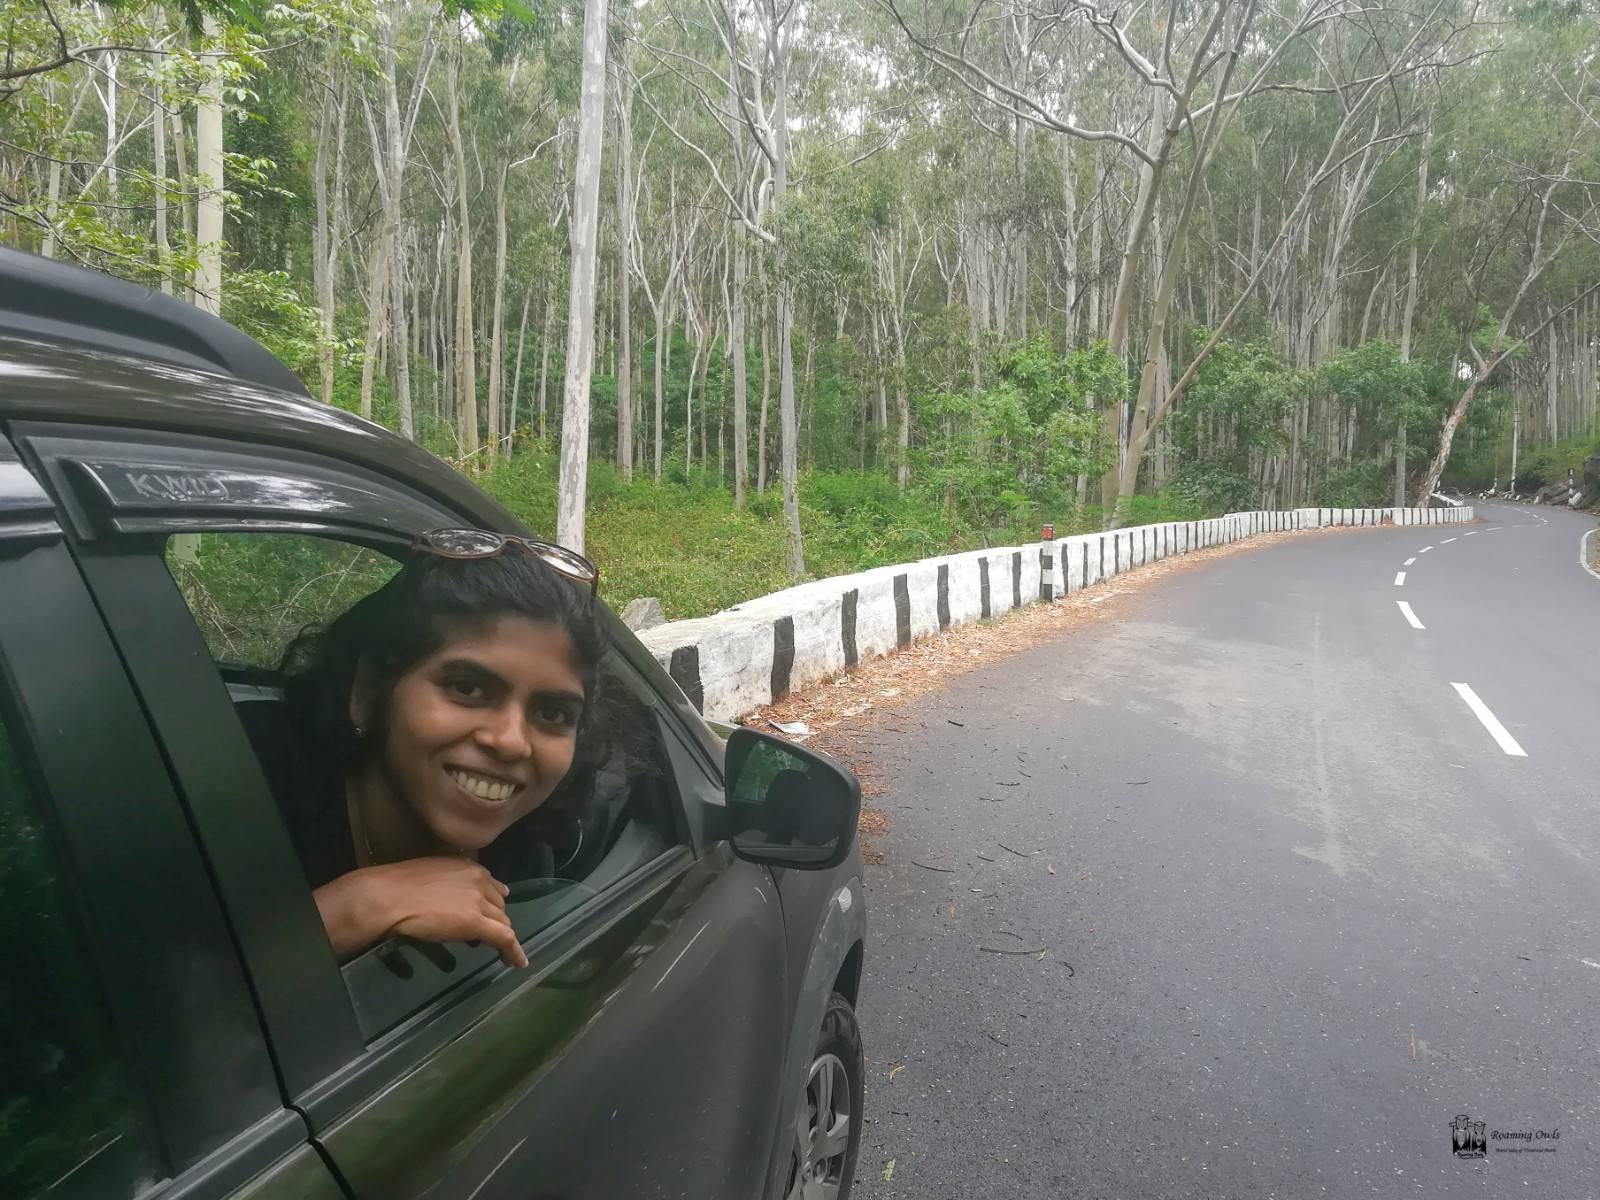 Paulmathi Vinod,Yelagiri Eucalyptus forest,Kwid Drive chennai tamilnadu